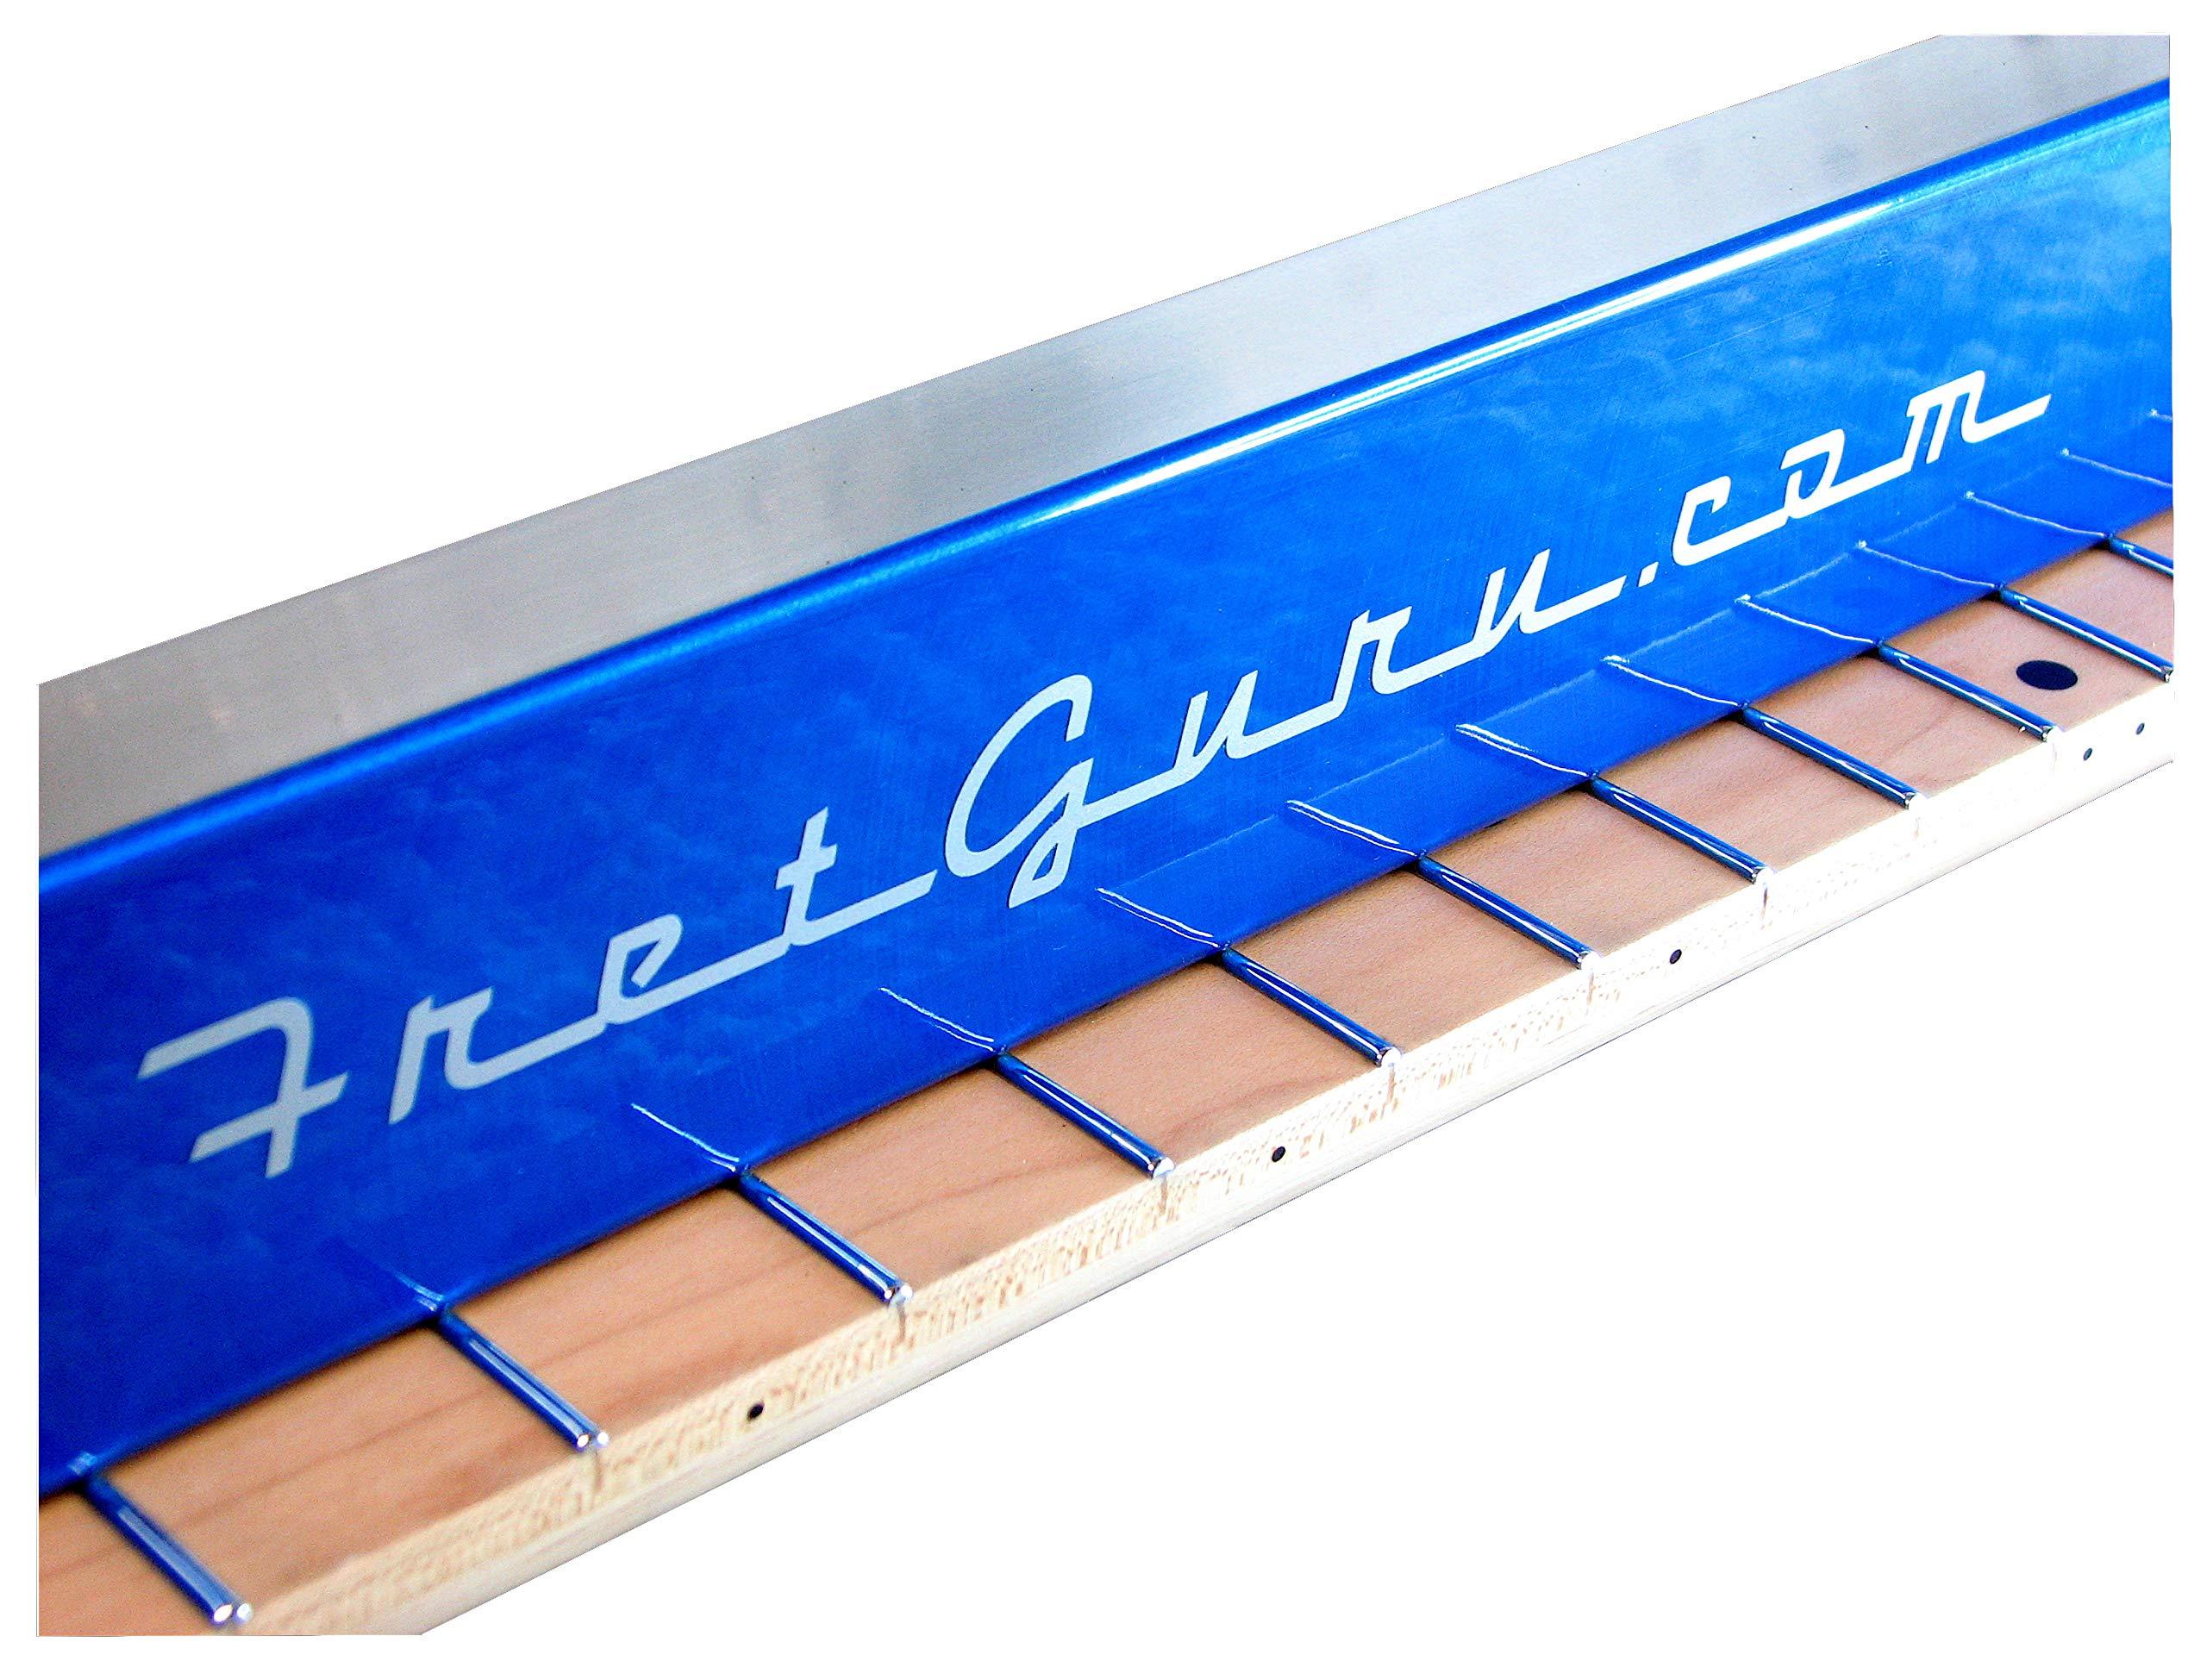 FretGuru Precision Sanding Beam Fret Leveler Leveling File Pro Luthier Guitar Tech Tool includes 100, 240, 320 sandpaper [FINALLY BACK IN STOCK - FRESH BATCH JUST ARRIVED]